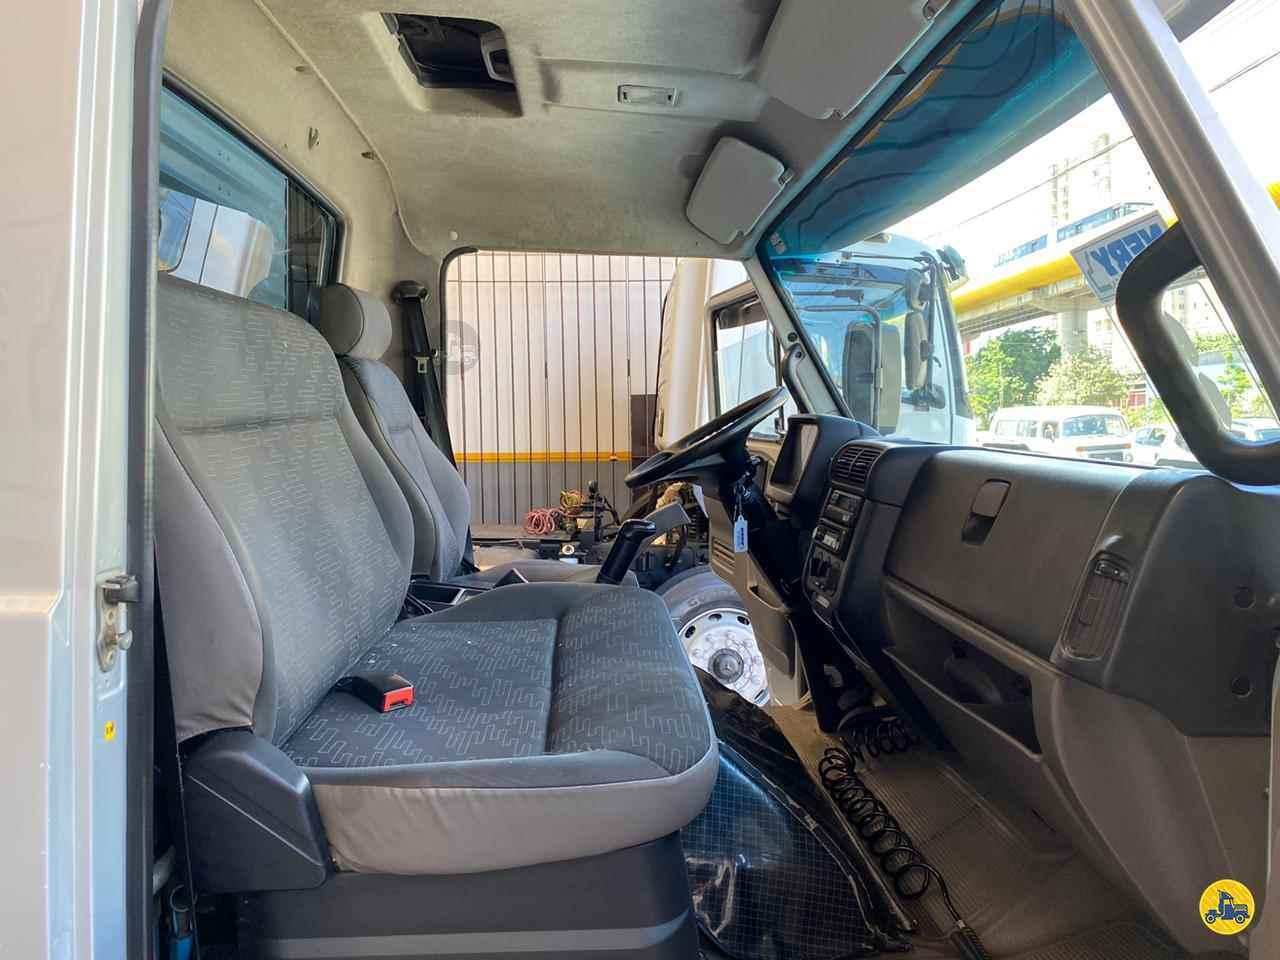 VOLKSWAGEN VW 9160 300000km 2013/2013 Nery Caminhões N.C.V.